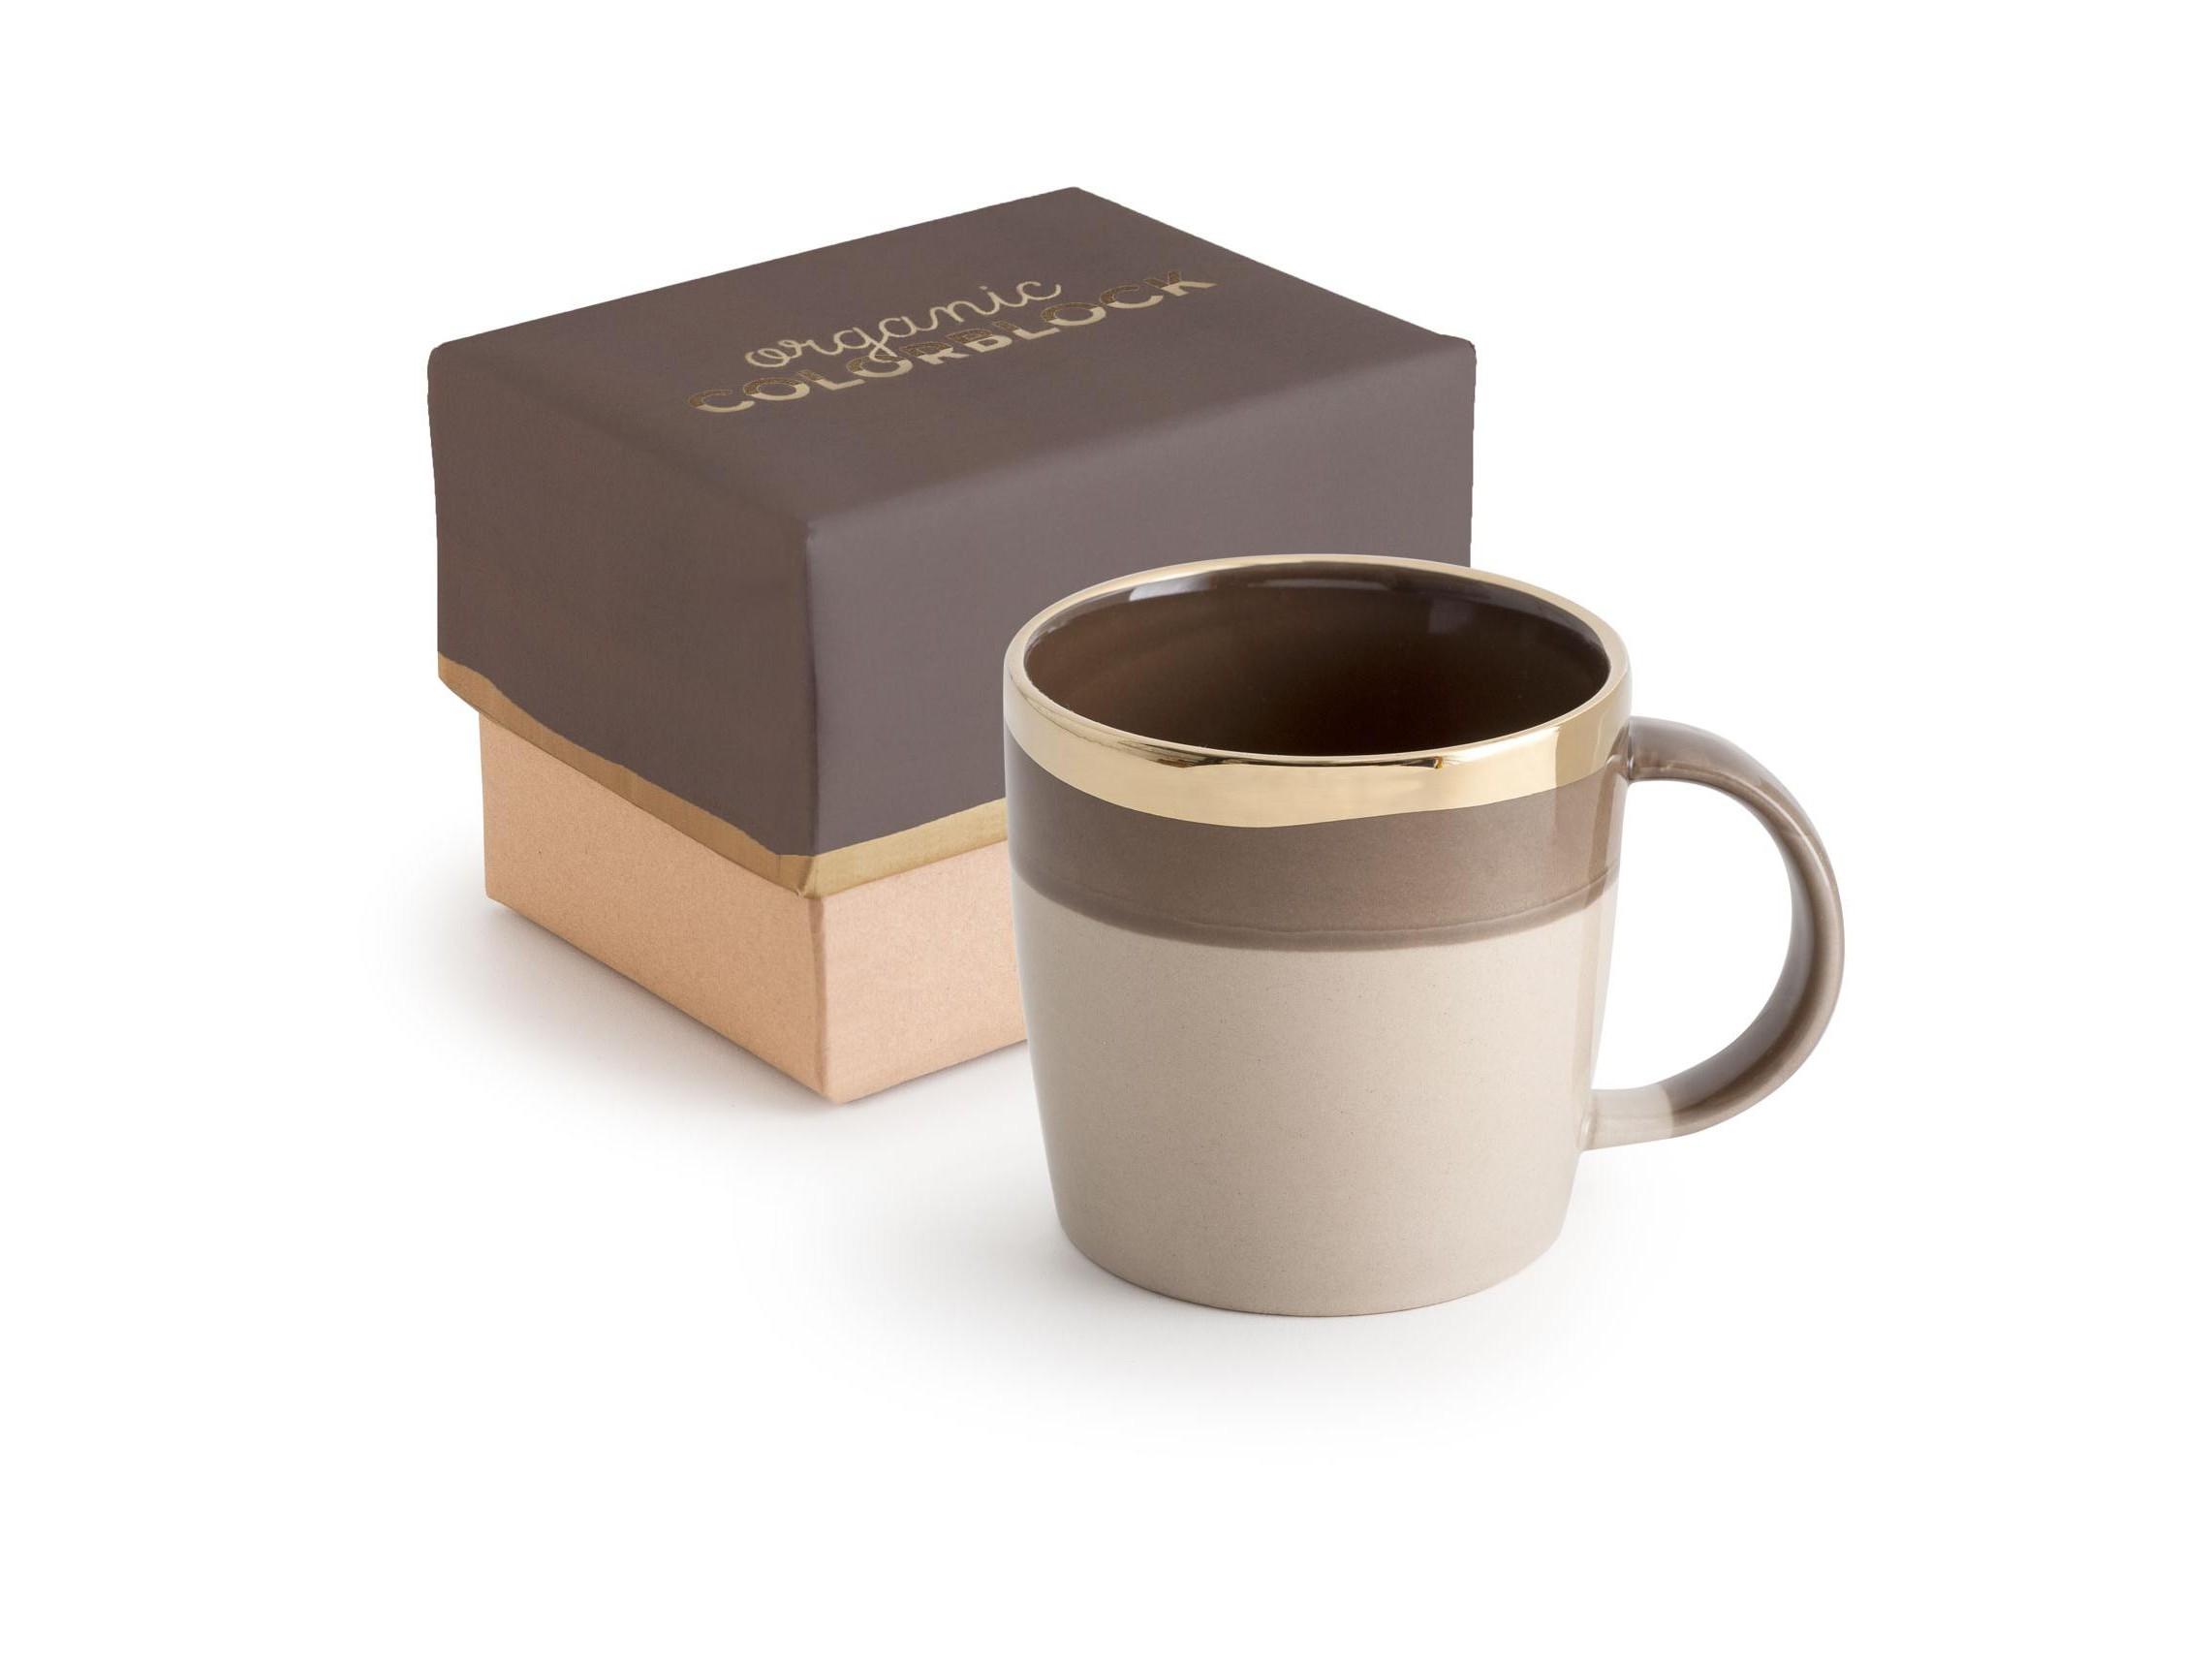 Чайный сервиз Rosanna 15437908 от thefurnish